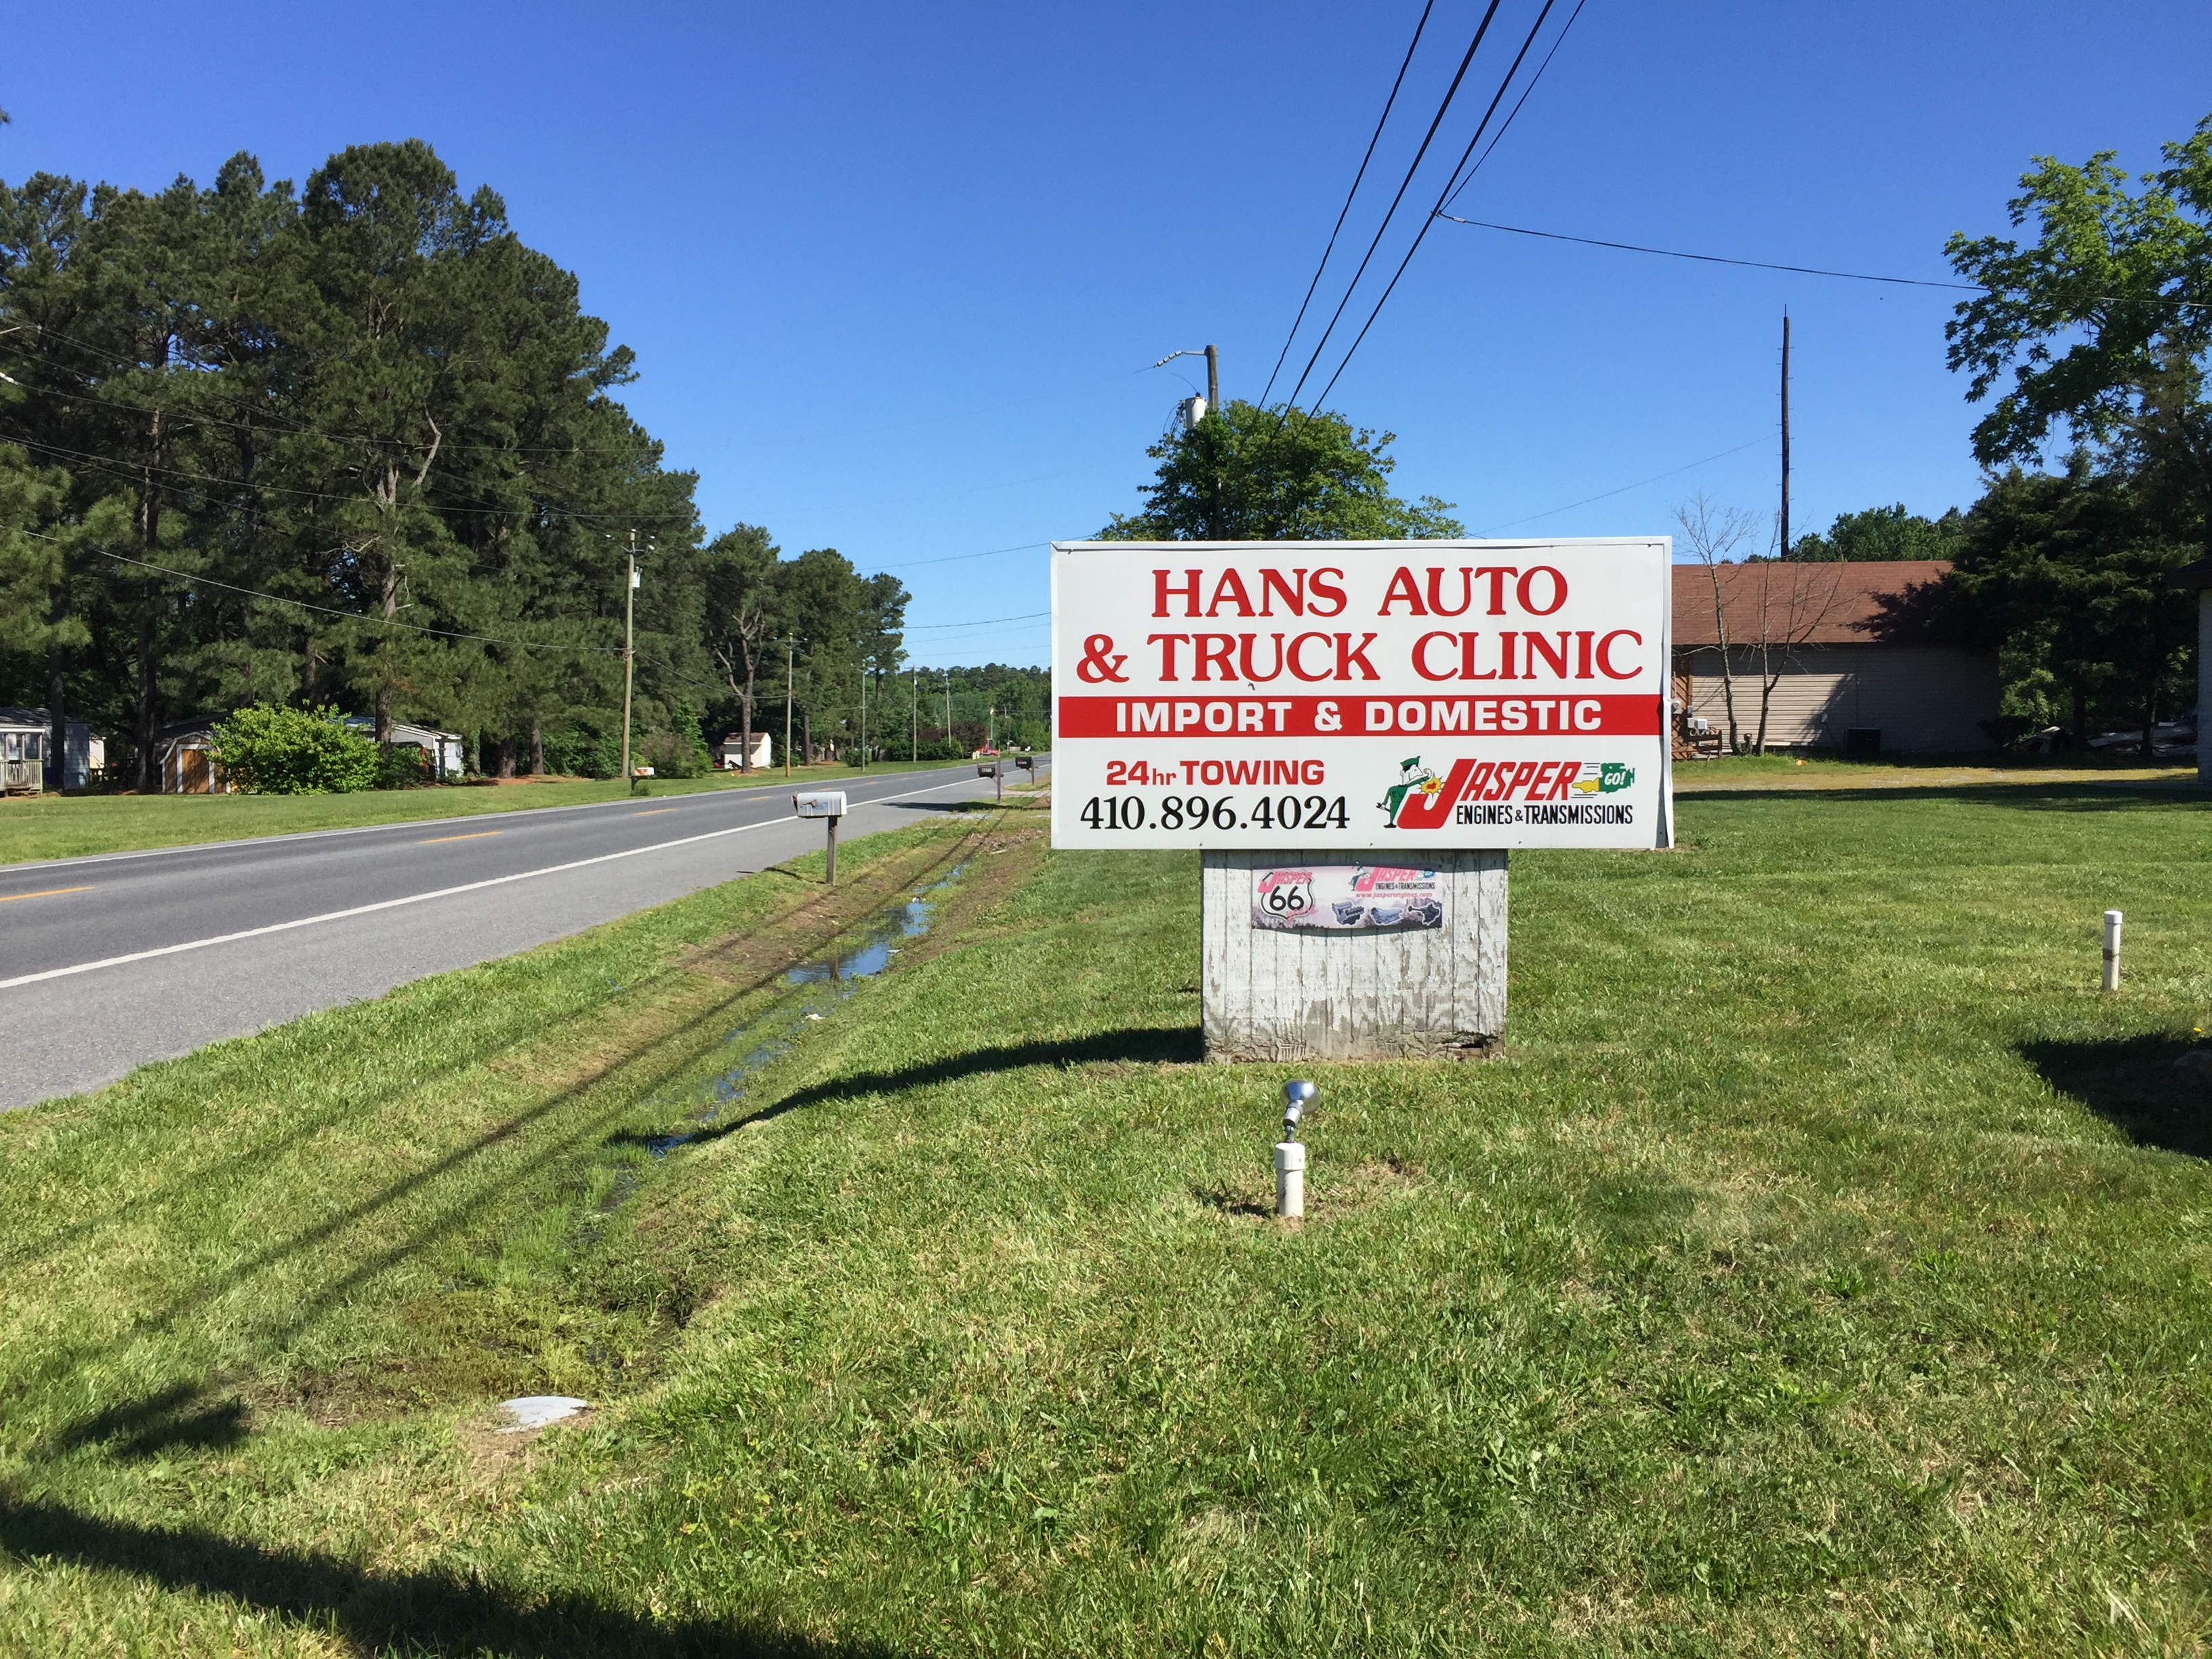 Hans' Auto & Truck Clinic image 2